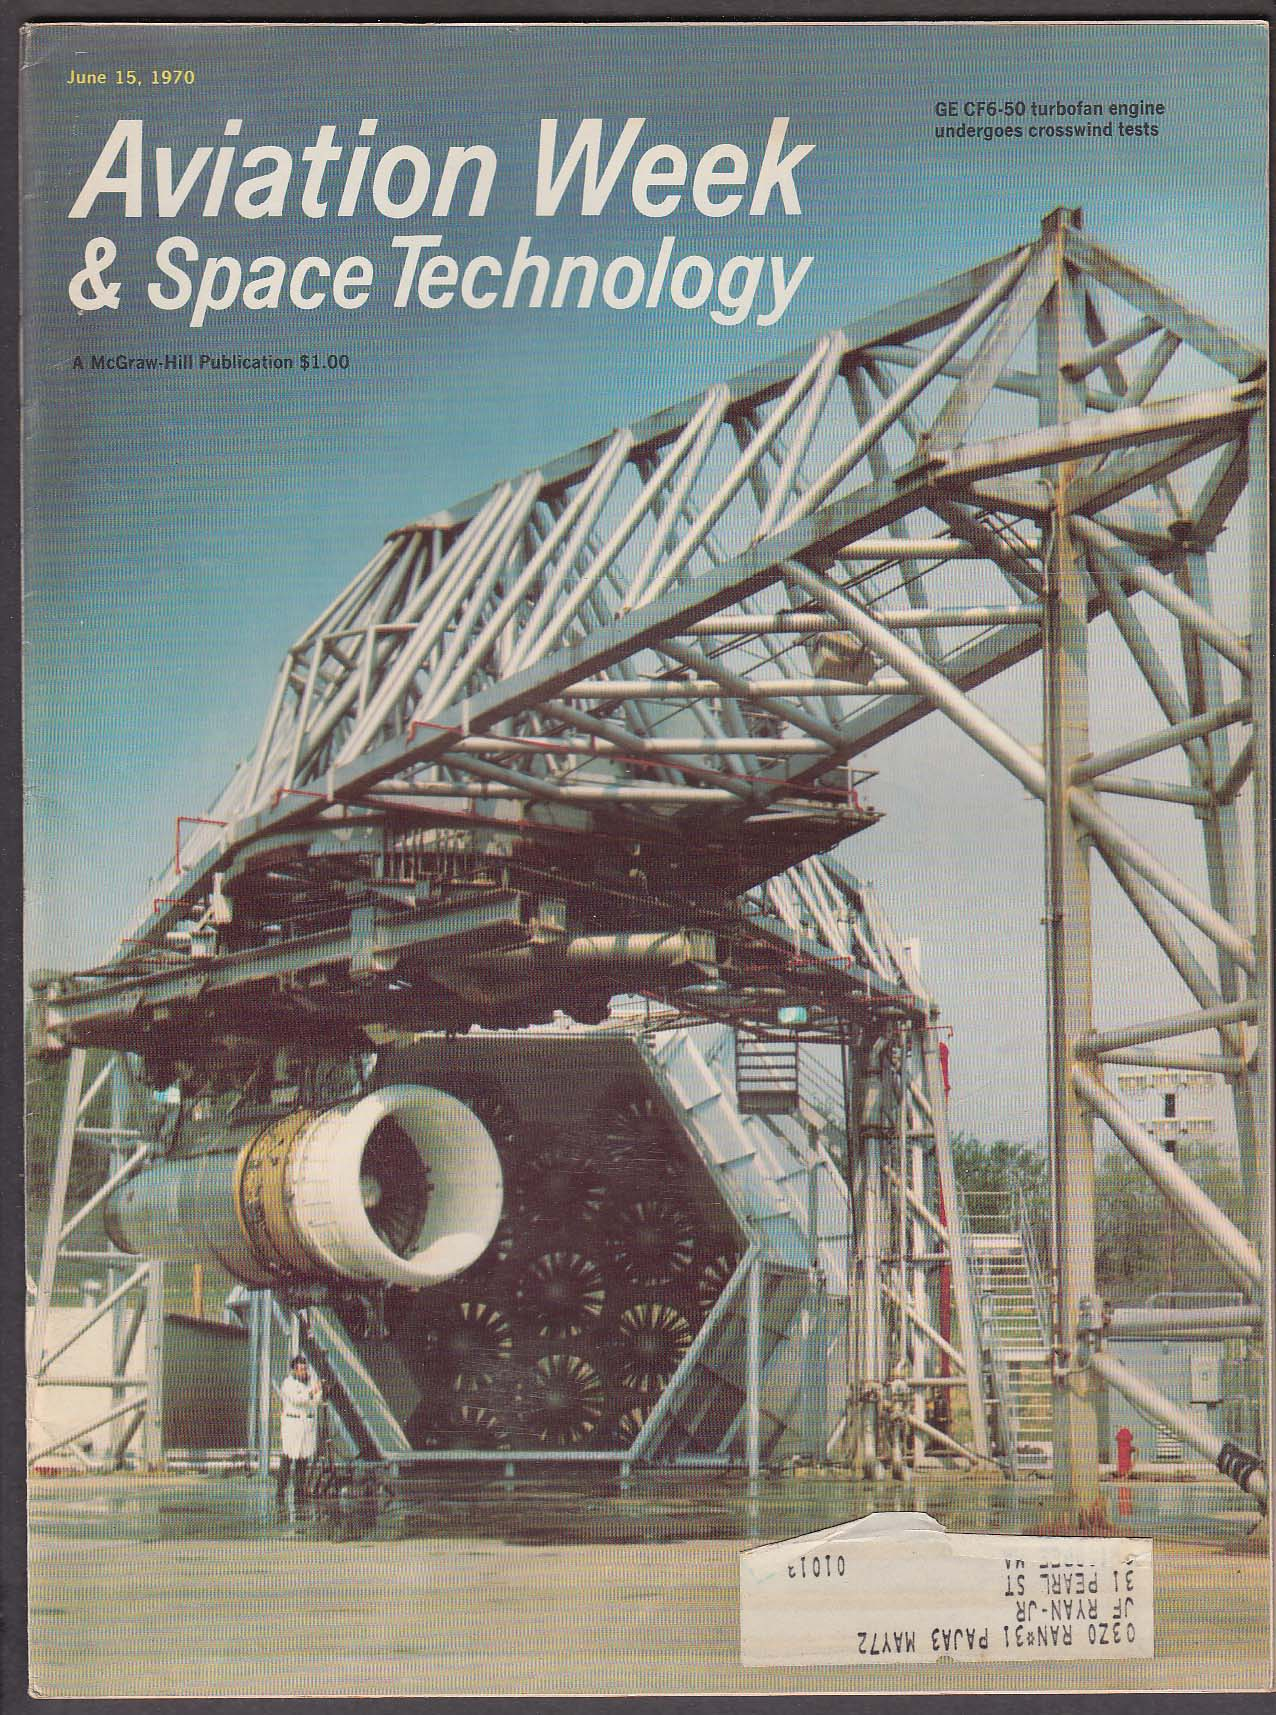 Image for AVIATION WEEK & Space Technology GE CF6-50 turbofan NASA Apollo 13 + 6/15 1970